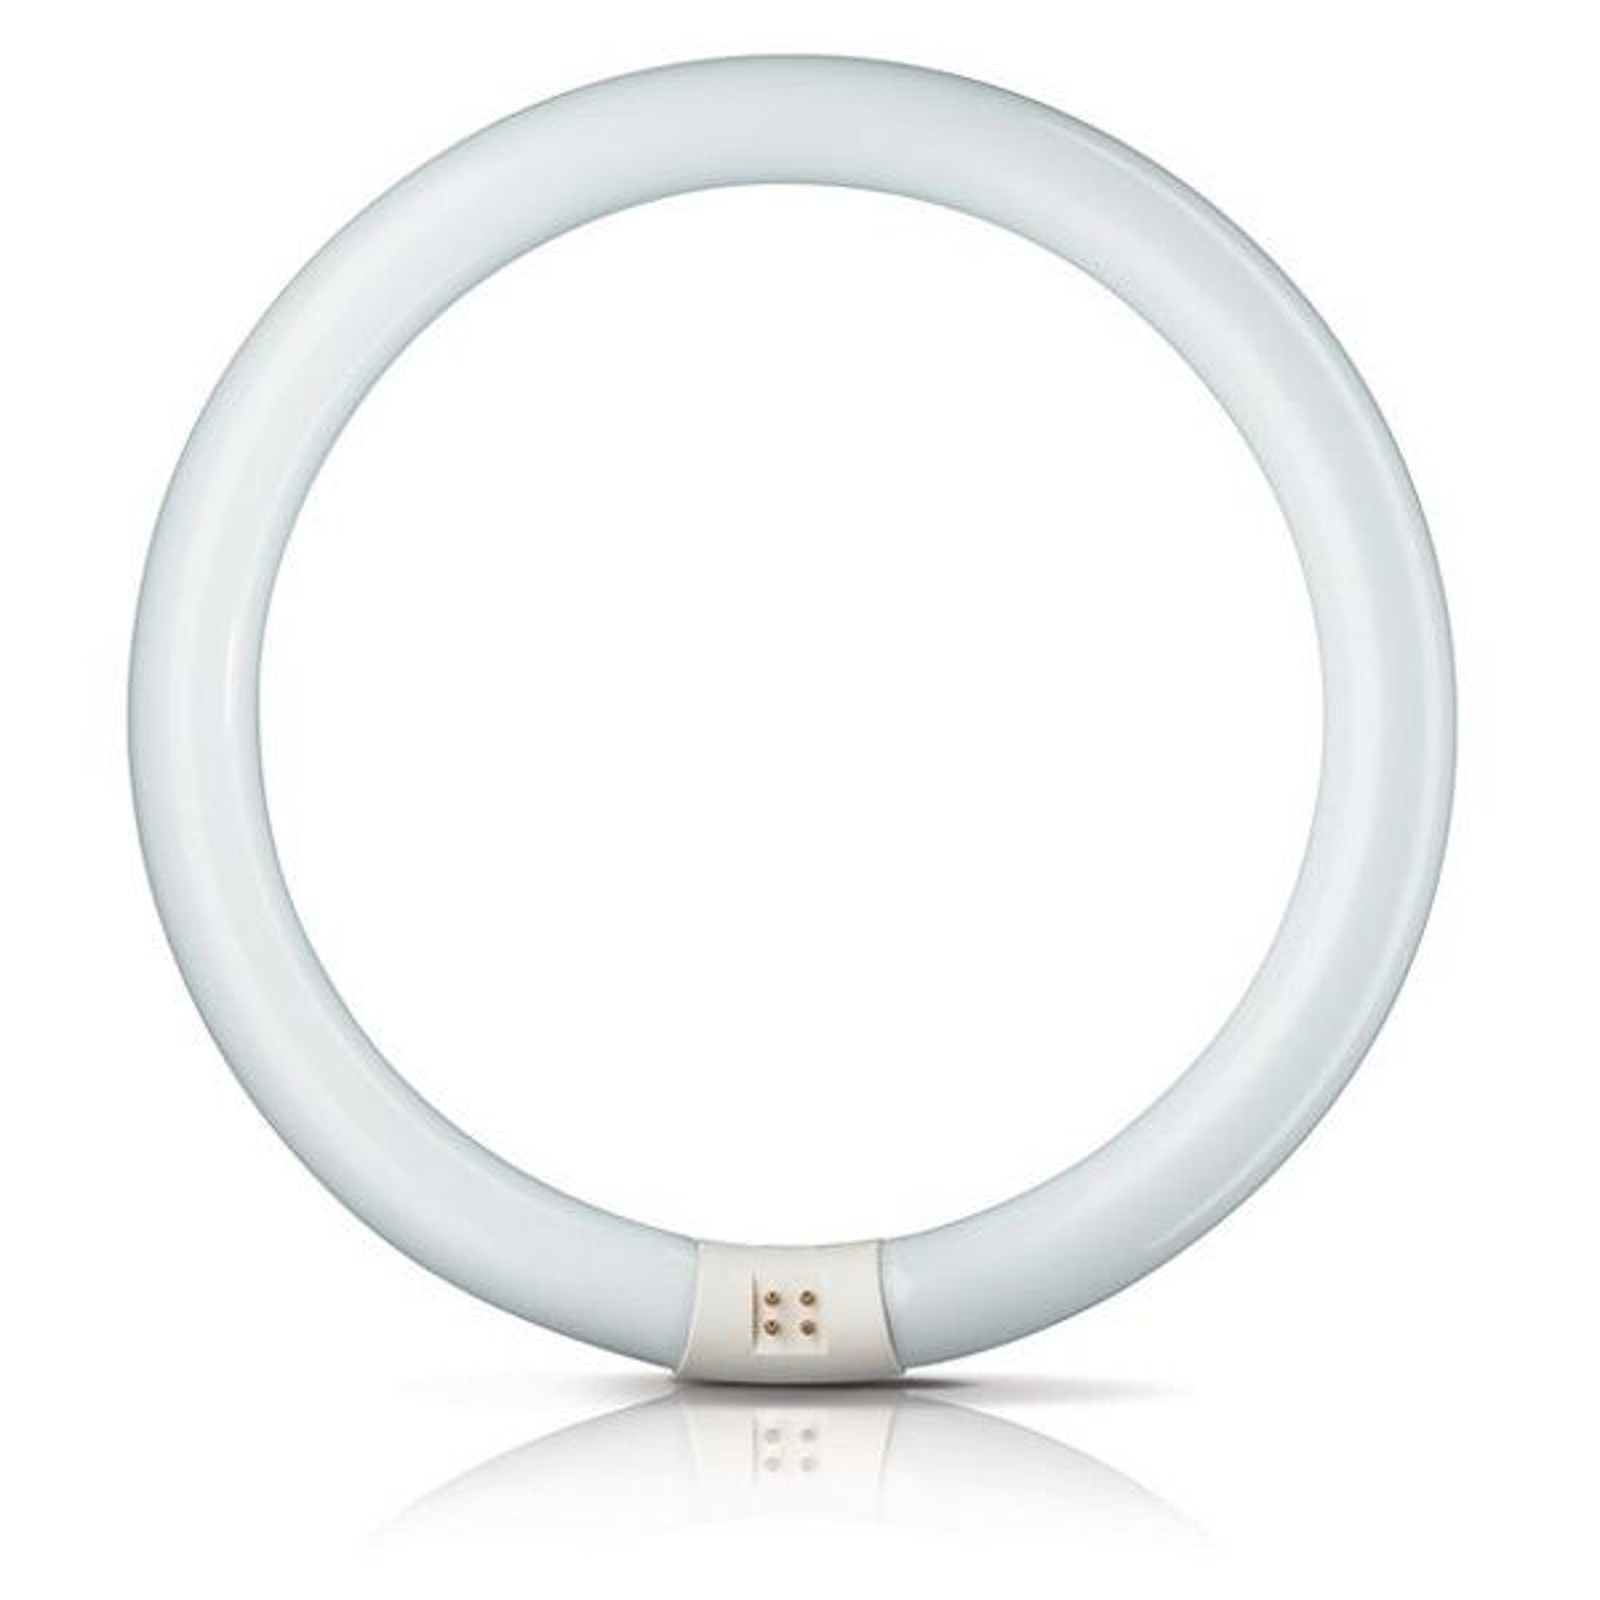 G10q 22W 865 Leuchtstoffring Master Circular TL-E